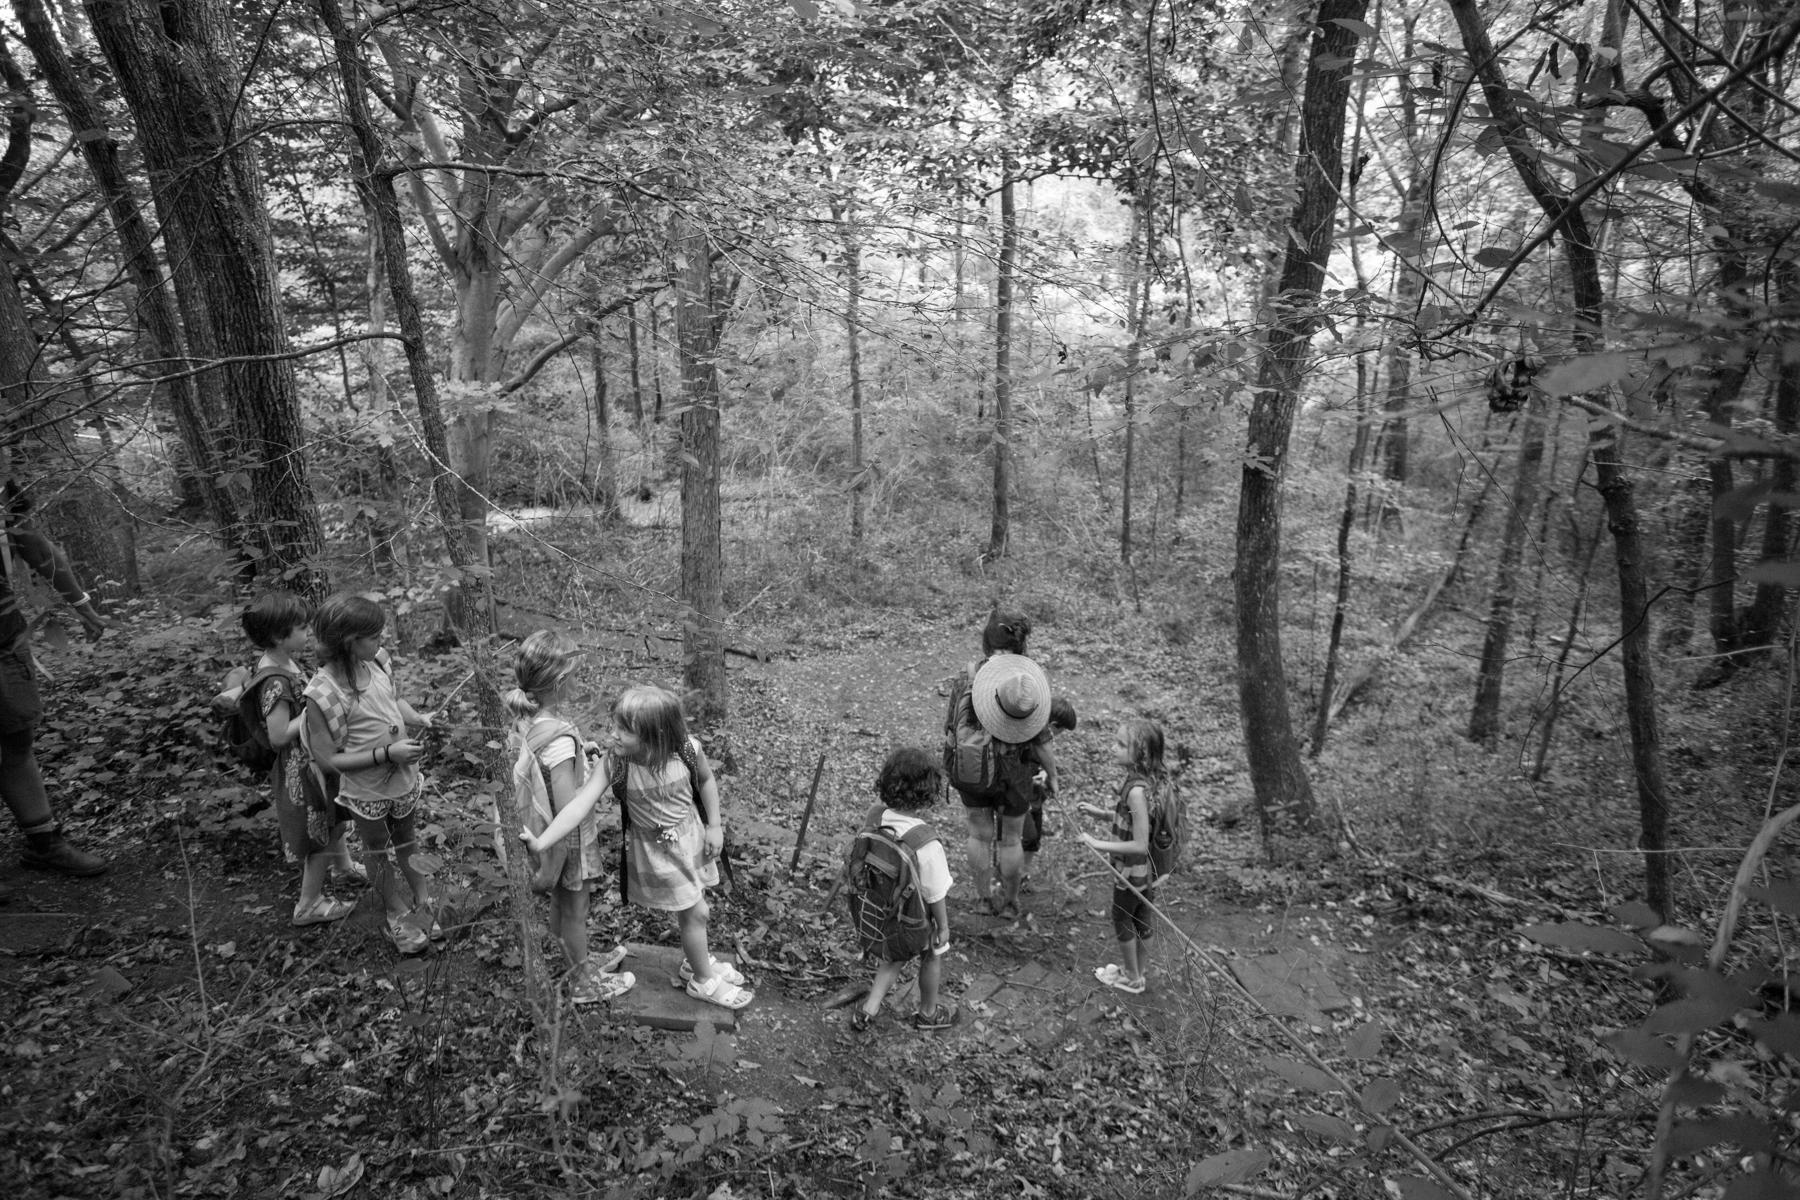 RA_story of the land camp-201606308111.jpg